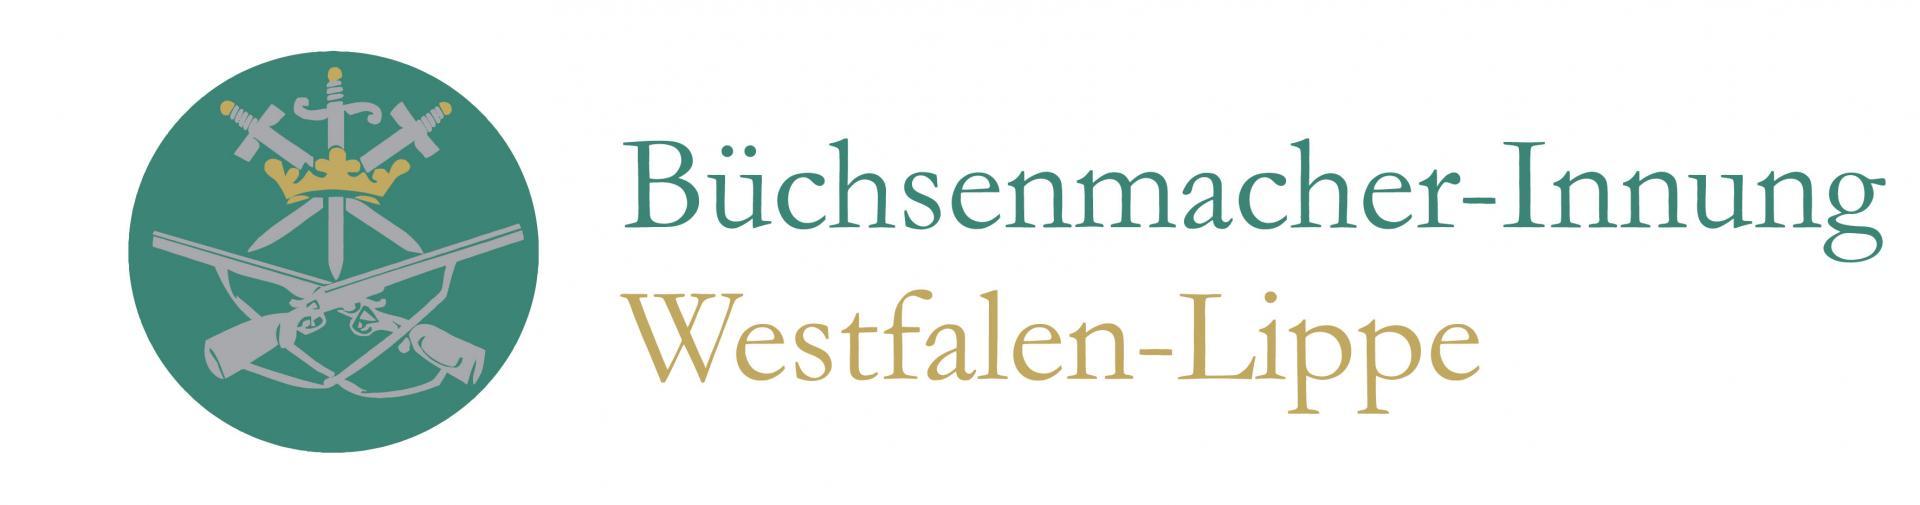 Büchsenmacher Westfalen-Lippe